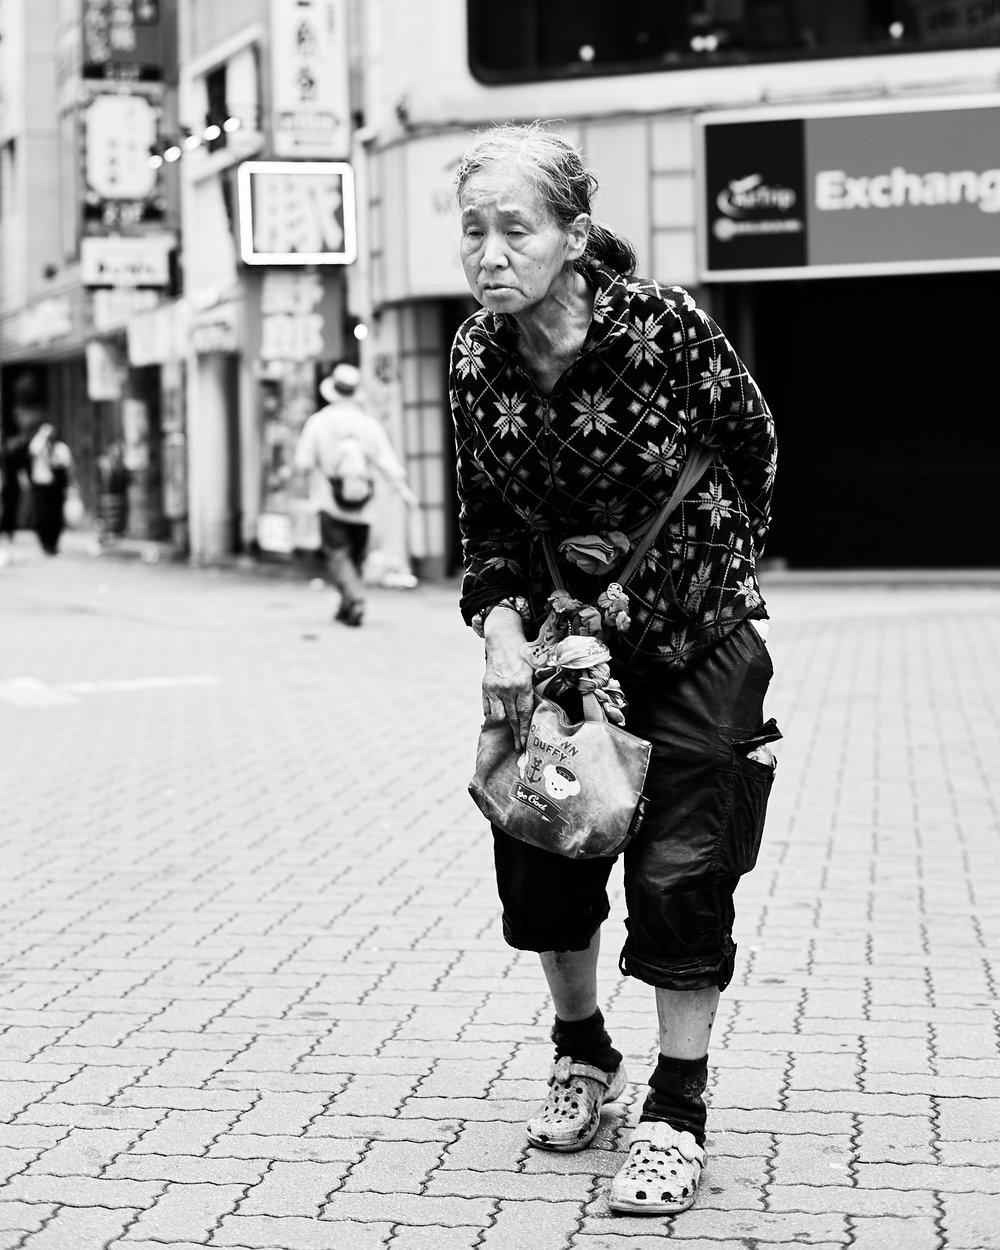 SnapPilots_17-07-01_Tokyo2017_bnw_22.jpg